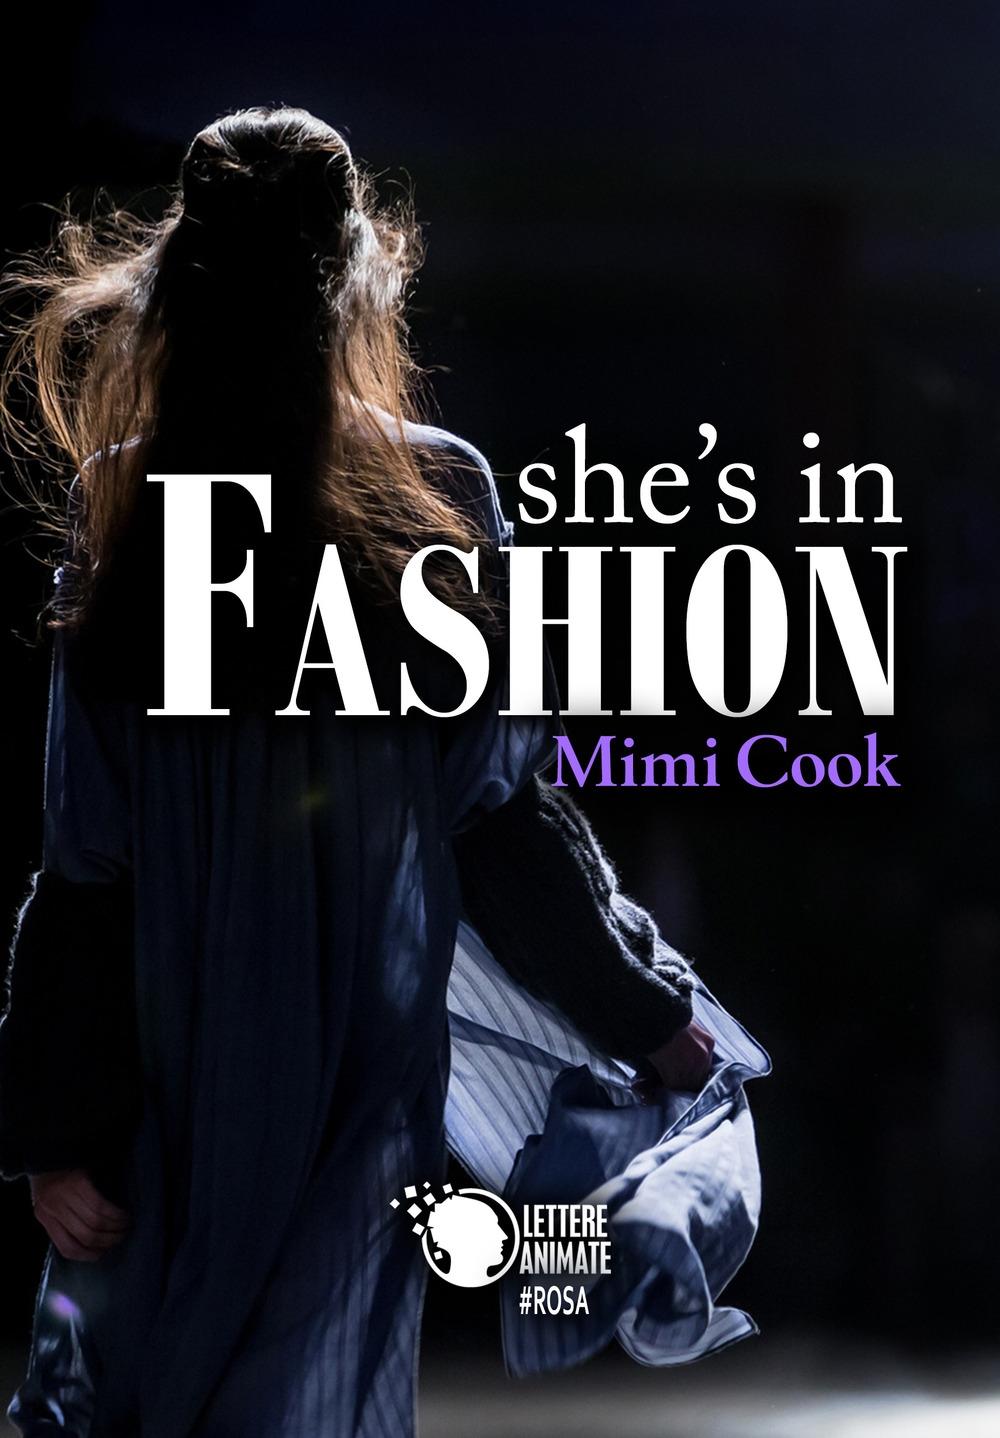 She's in fashion